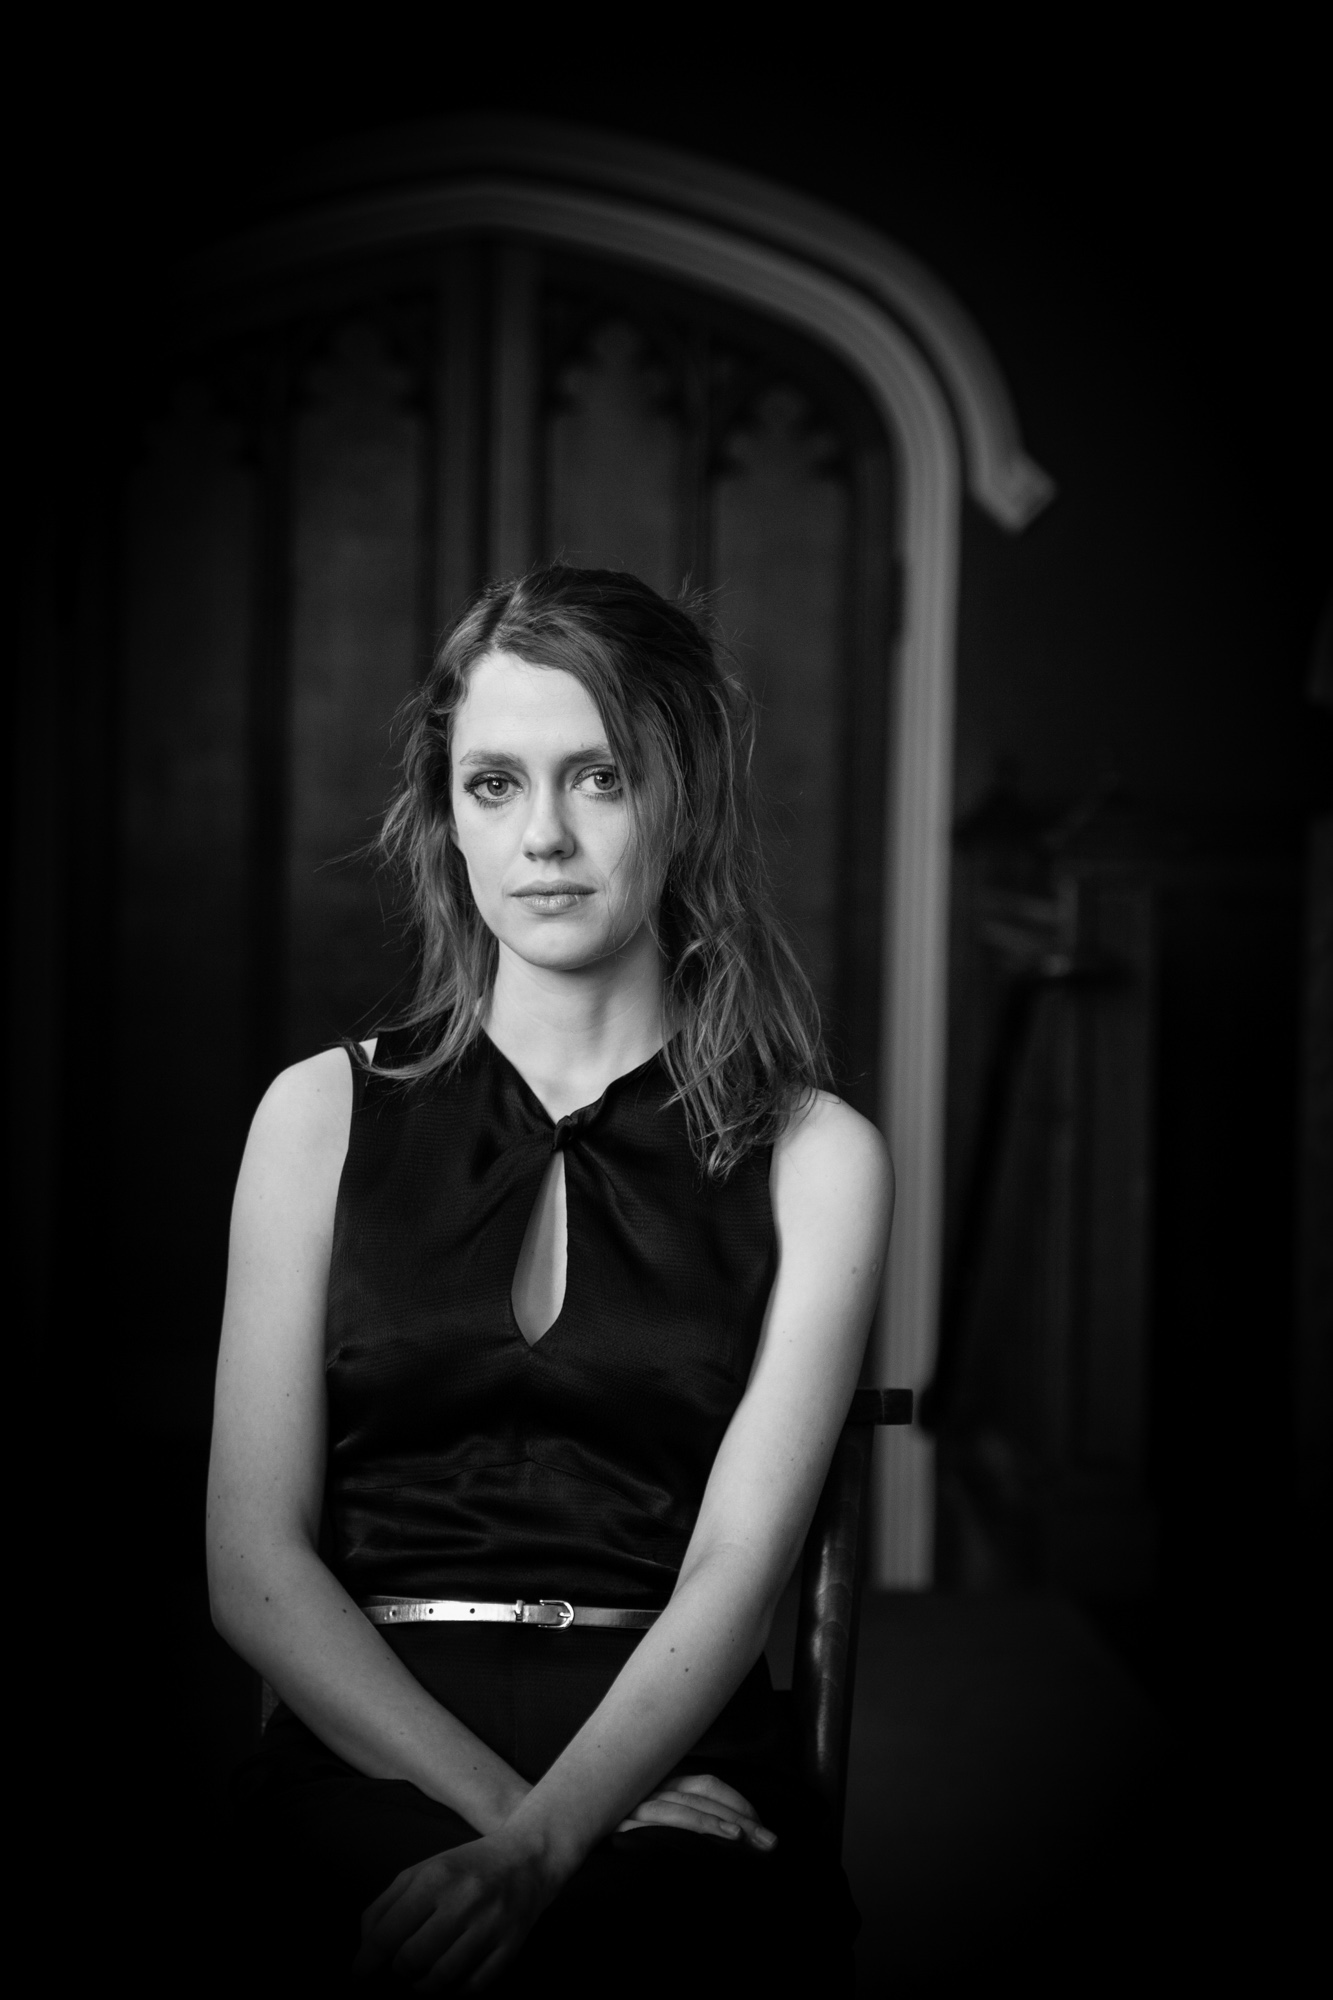 portraits-photographer-oxford-london-jonathan-self-photography_-17.jpg